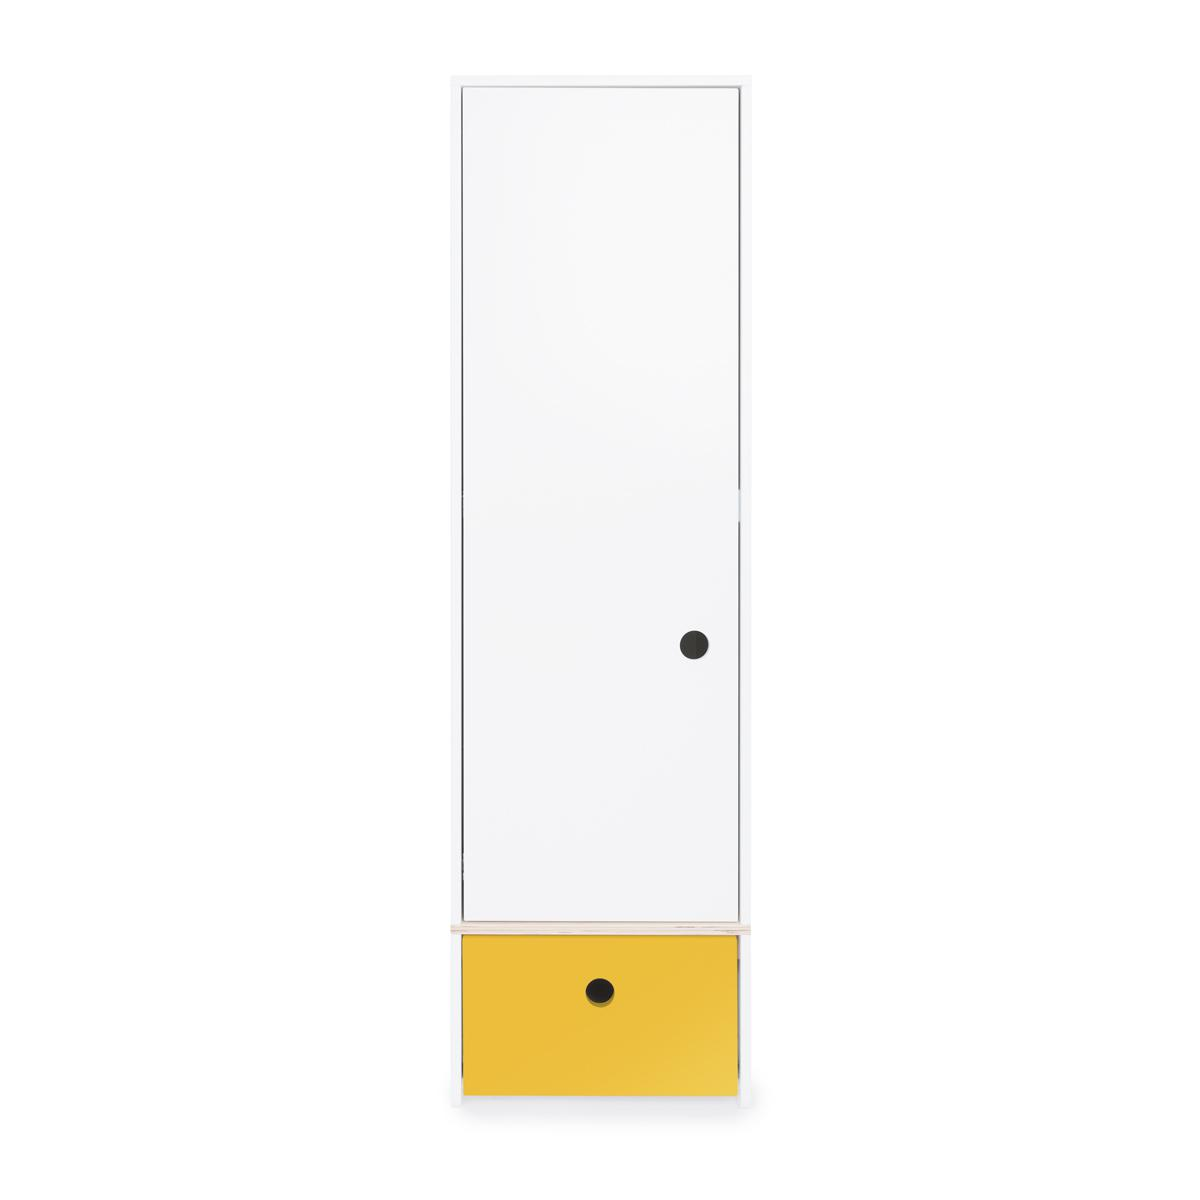 Armoire 1 porte COLORFLEX Abitare Kids façade tiroir nectar yellow